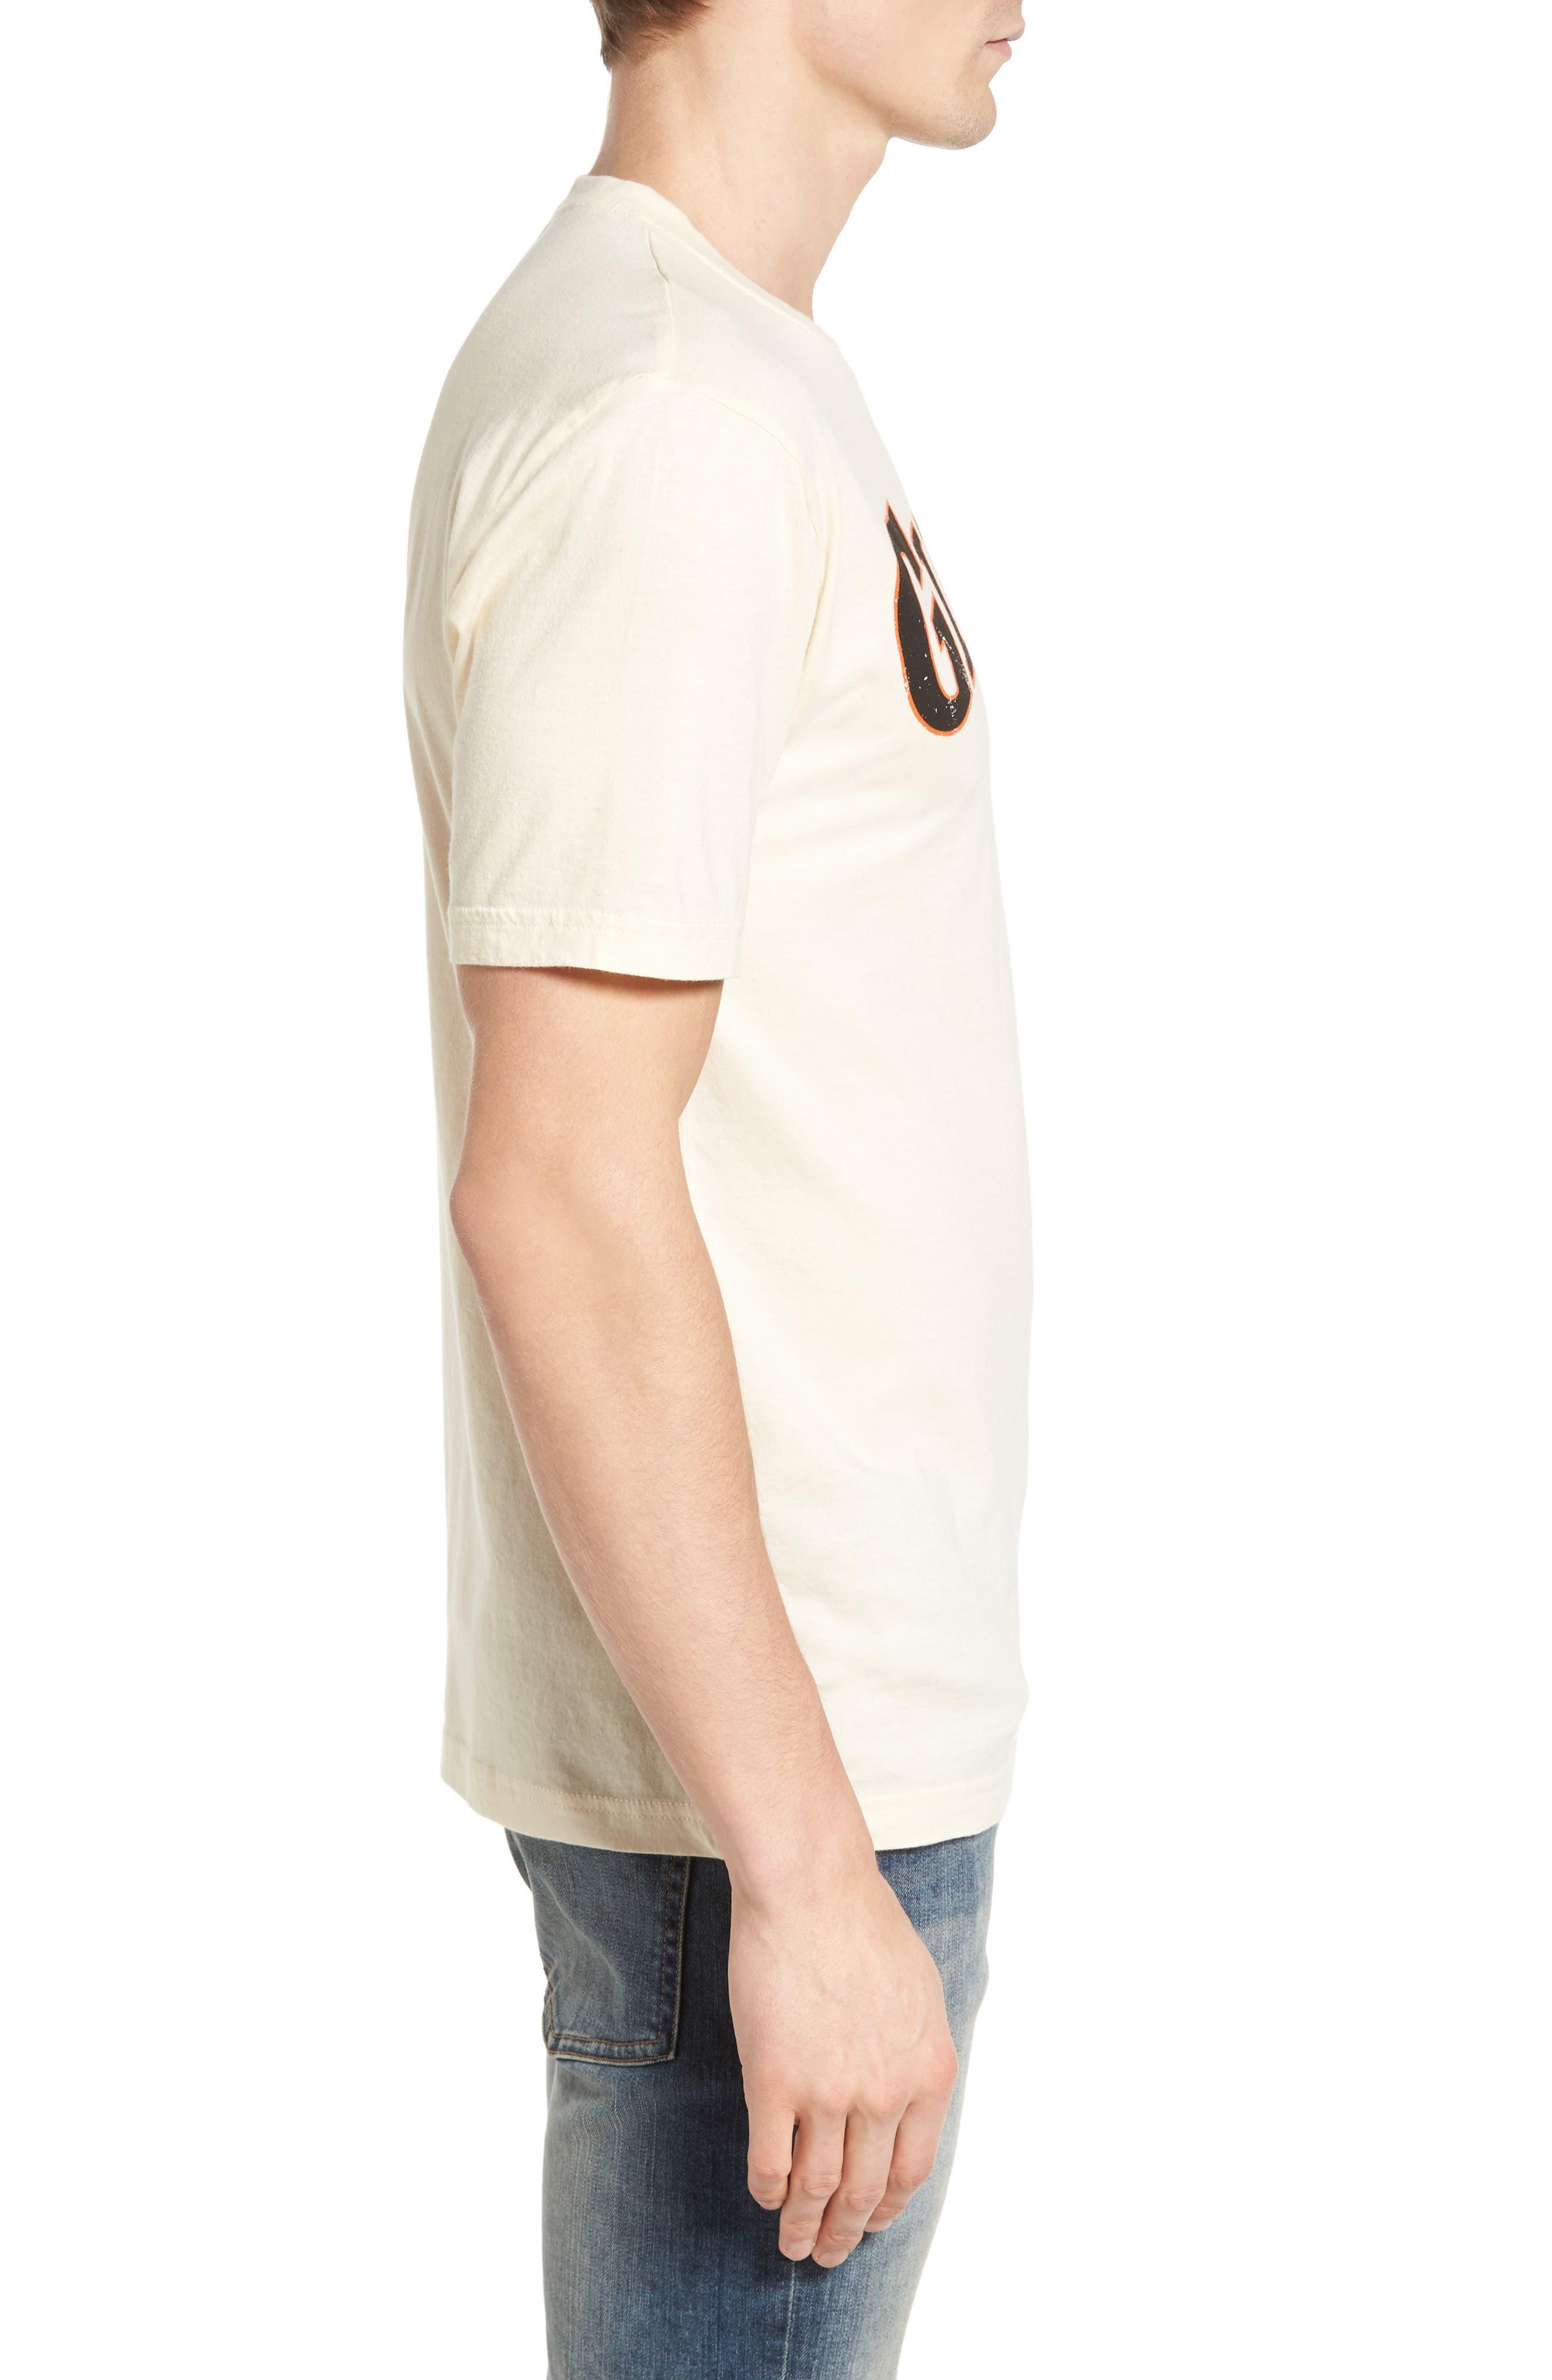 Brass Tack San Francisco Giants T-Shirt,                             Alternate thumbnail 3, color,                             124